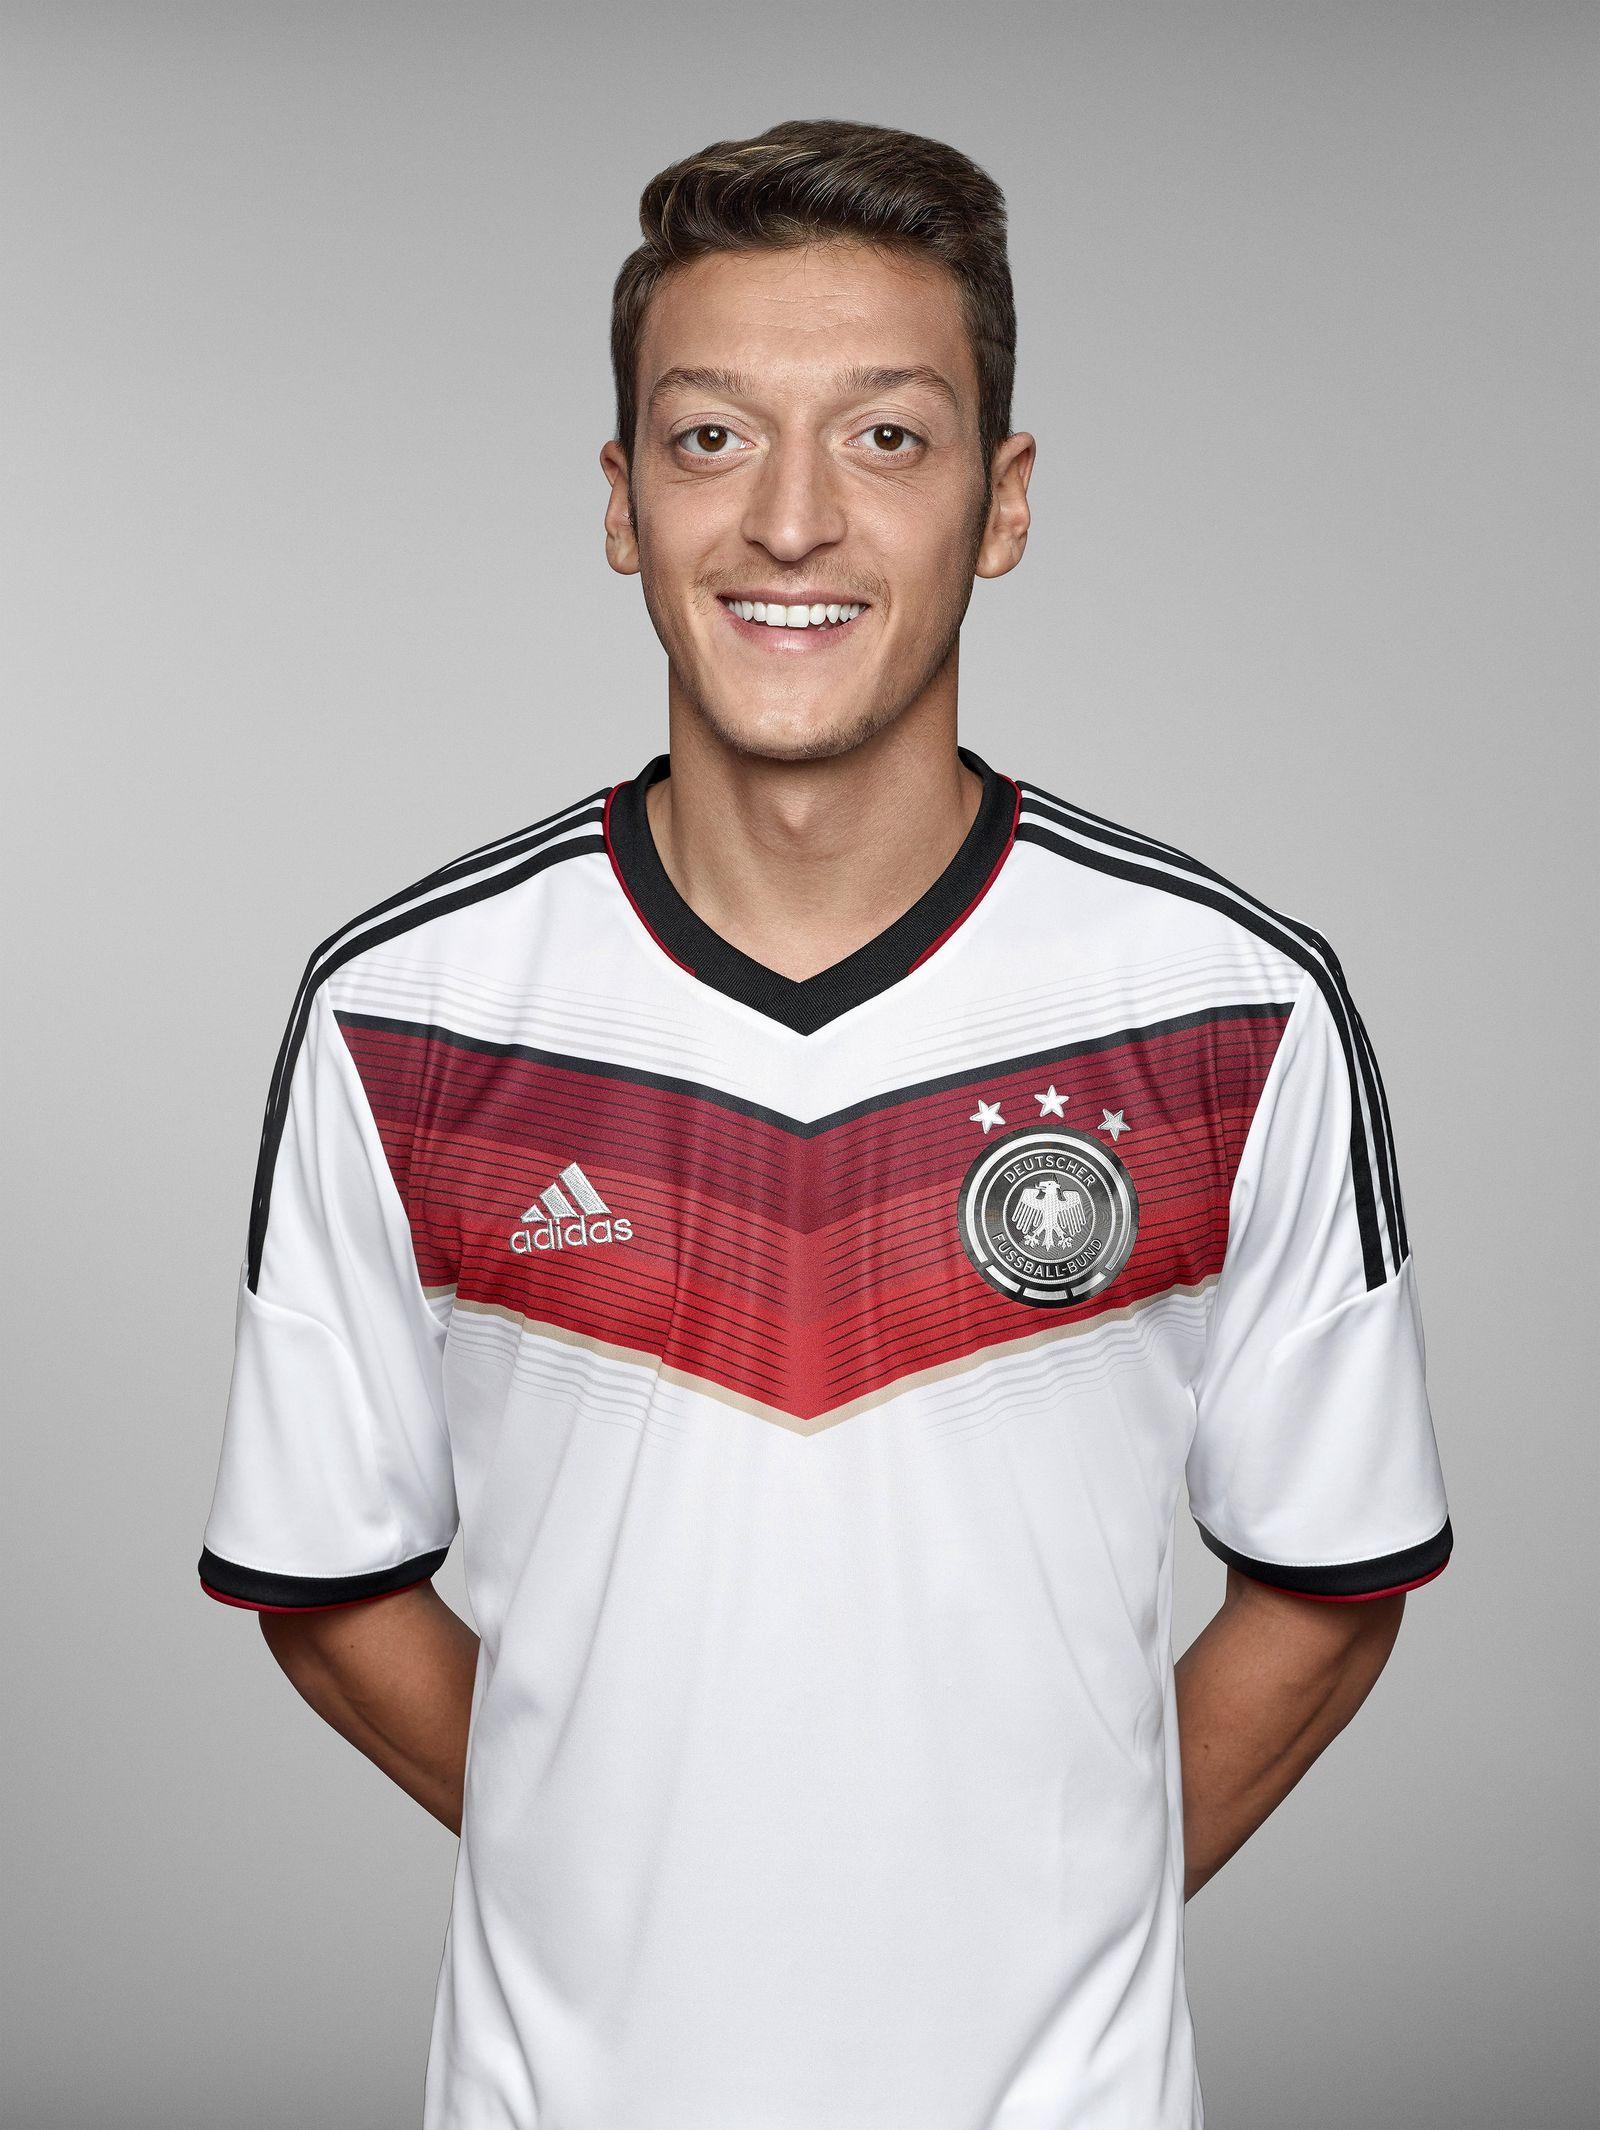 Fototermin Nationalmannschaft - Mesut Özil